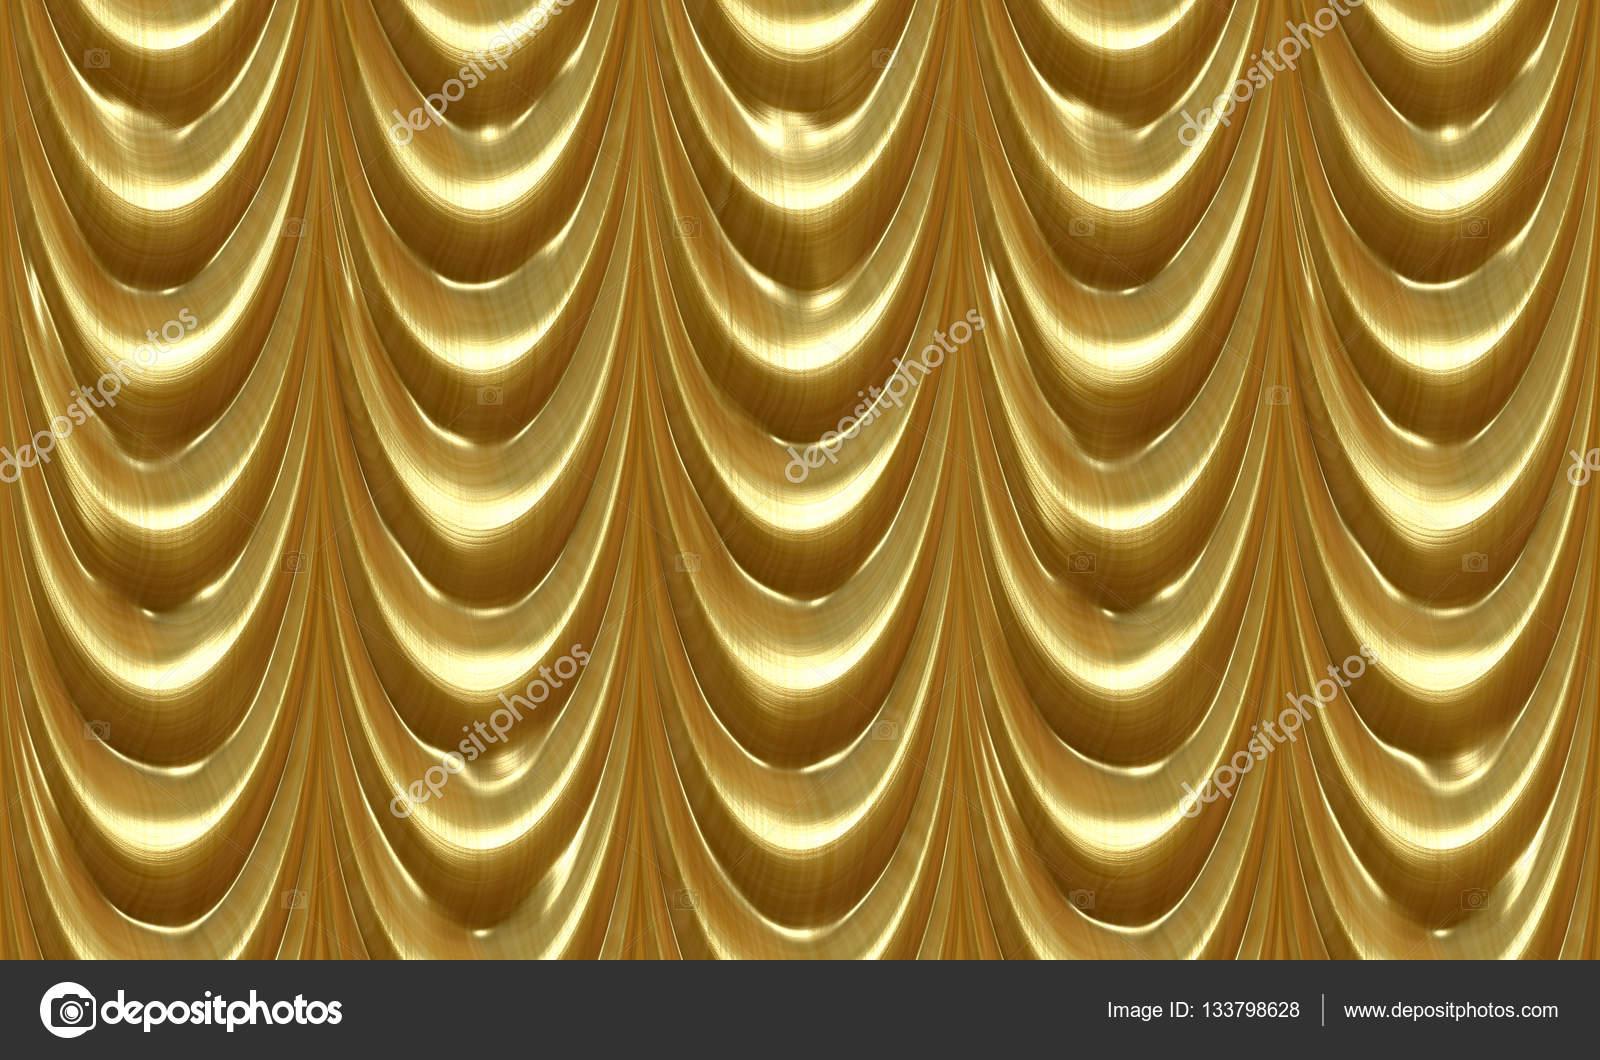 Gold Curtains Seamless Background Pattern Theater High Resolution Photo By ChristinaKrivonos